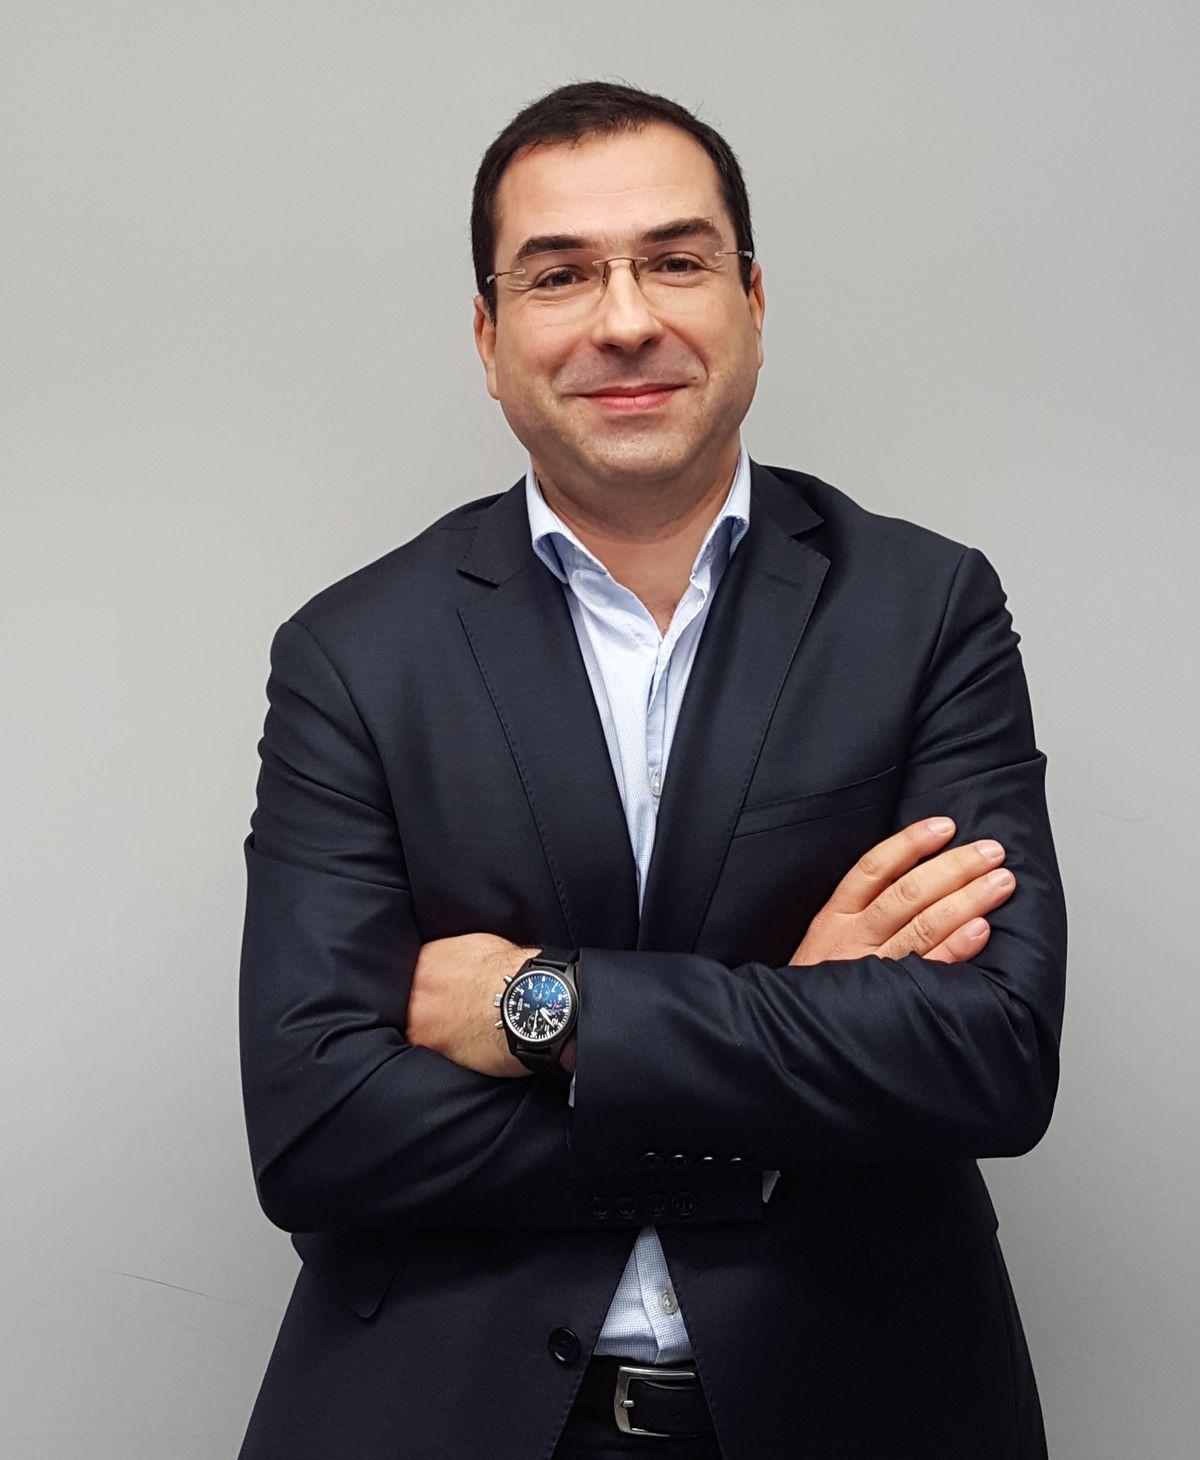 Karim Soleihavoup